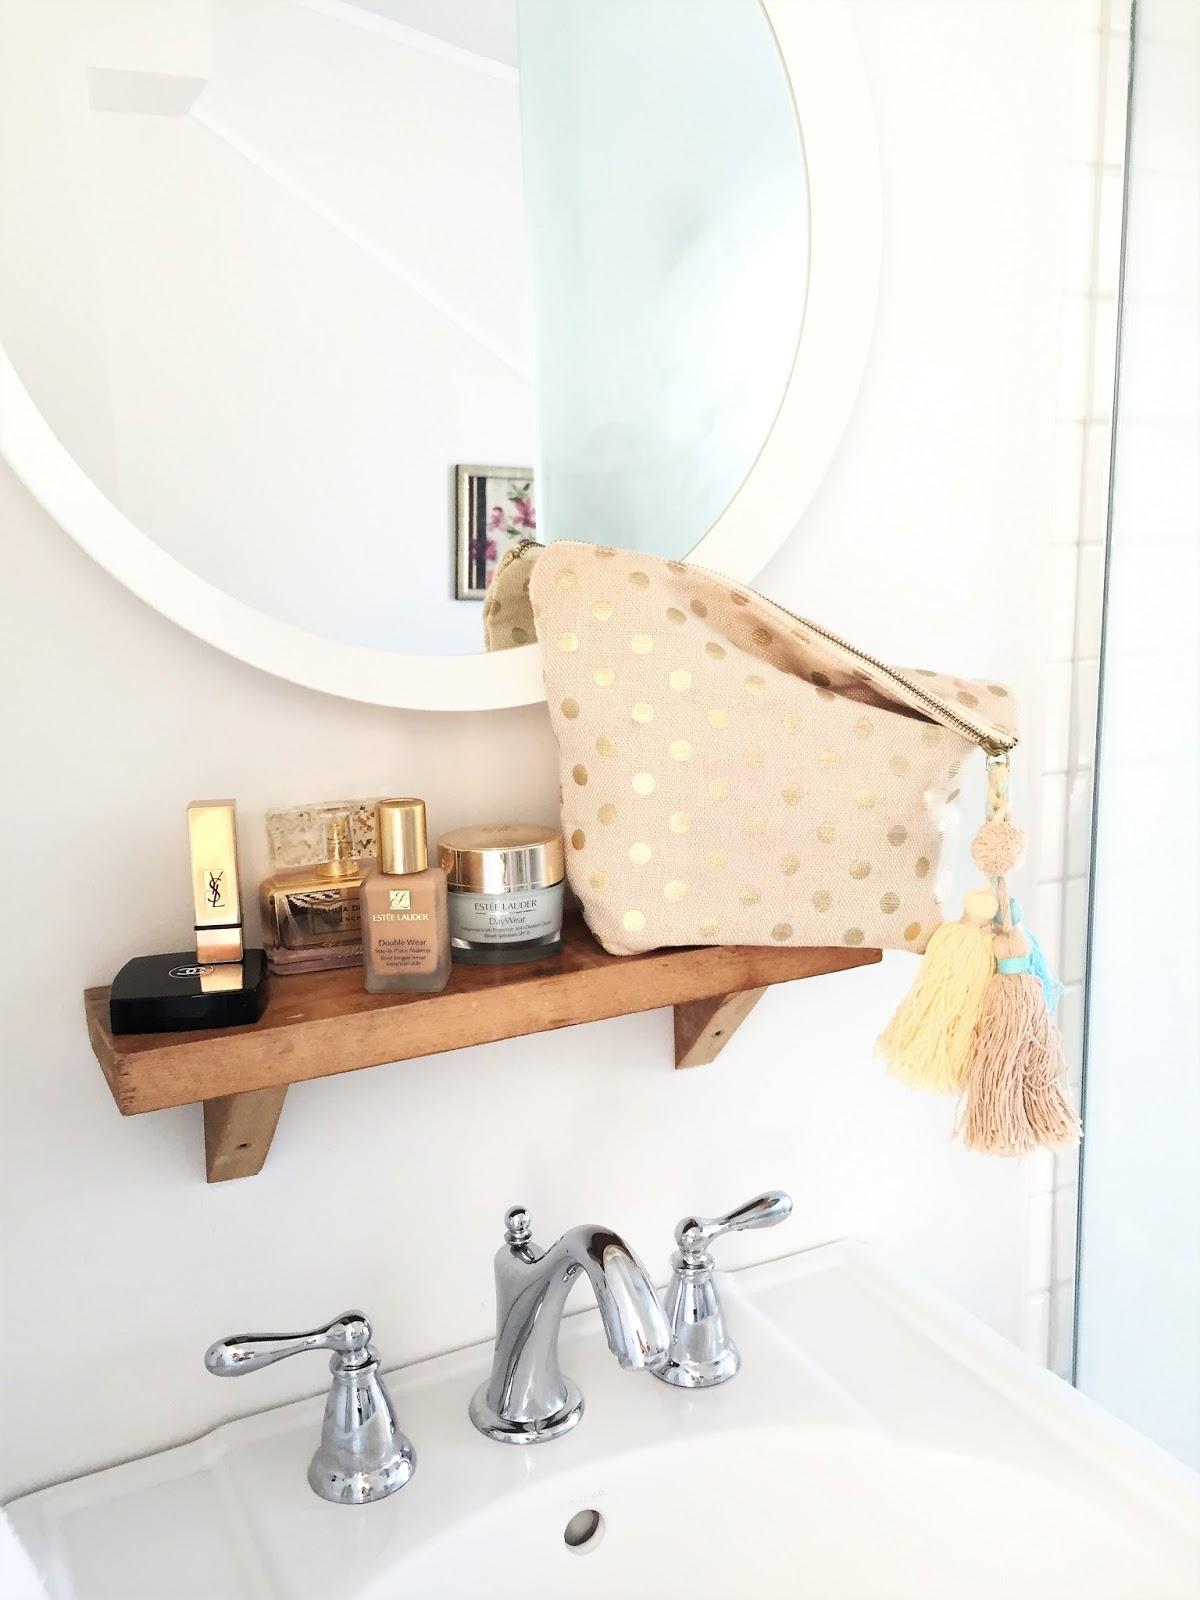 Bijuleni-The Ferg bathroom, Prince Edward County